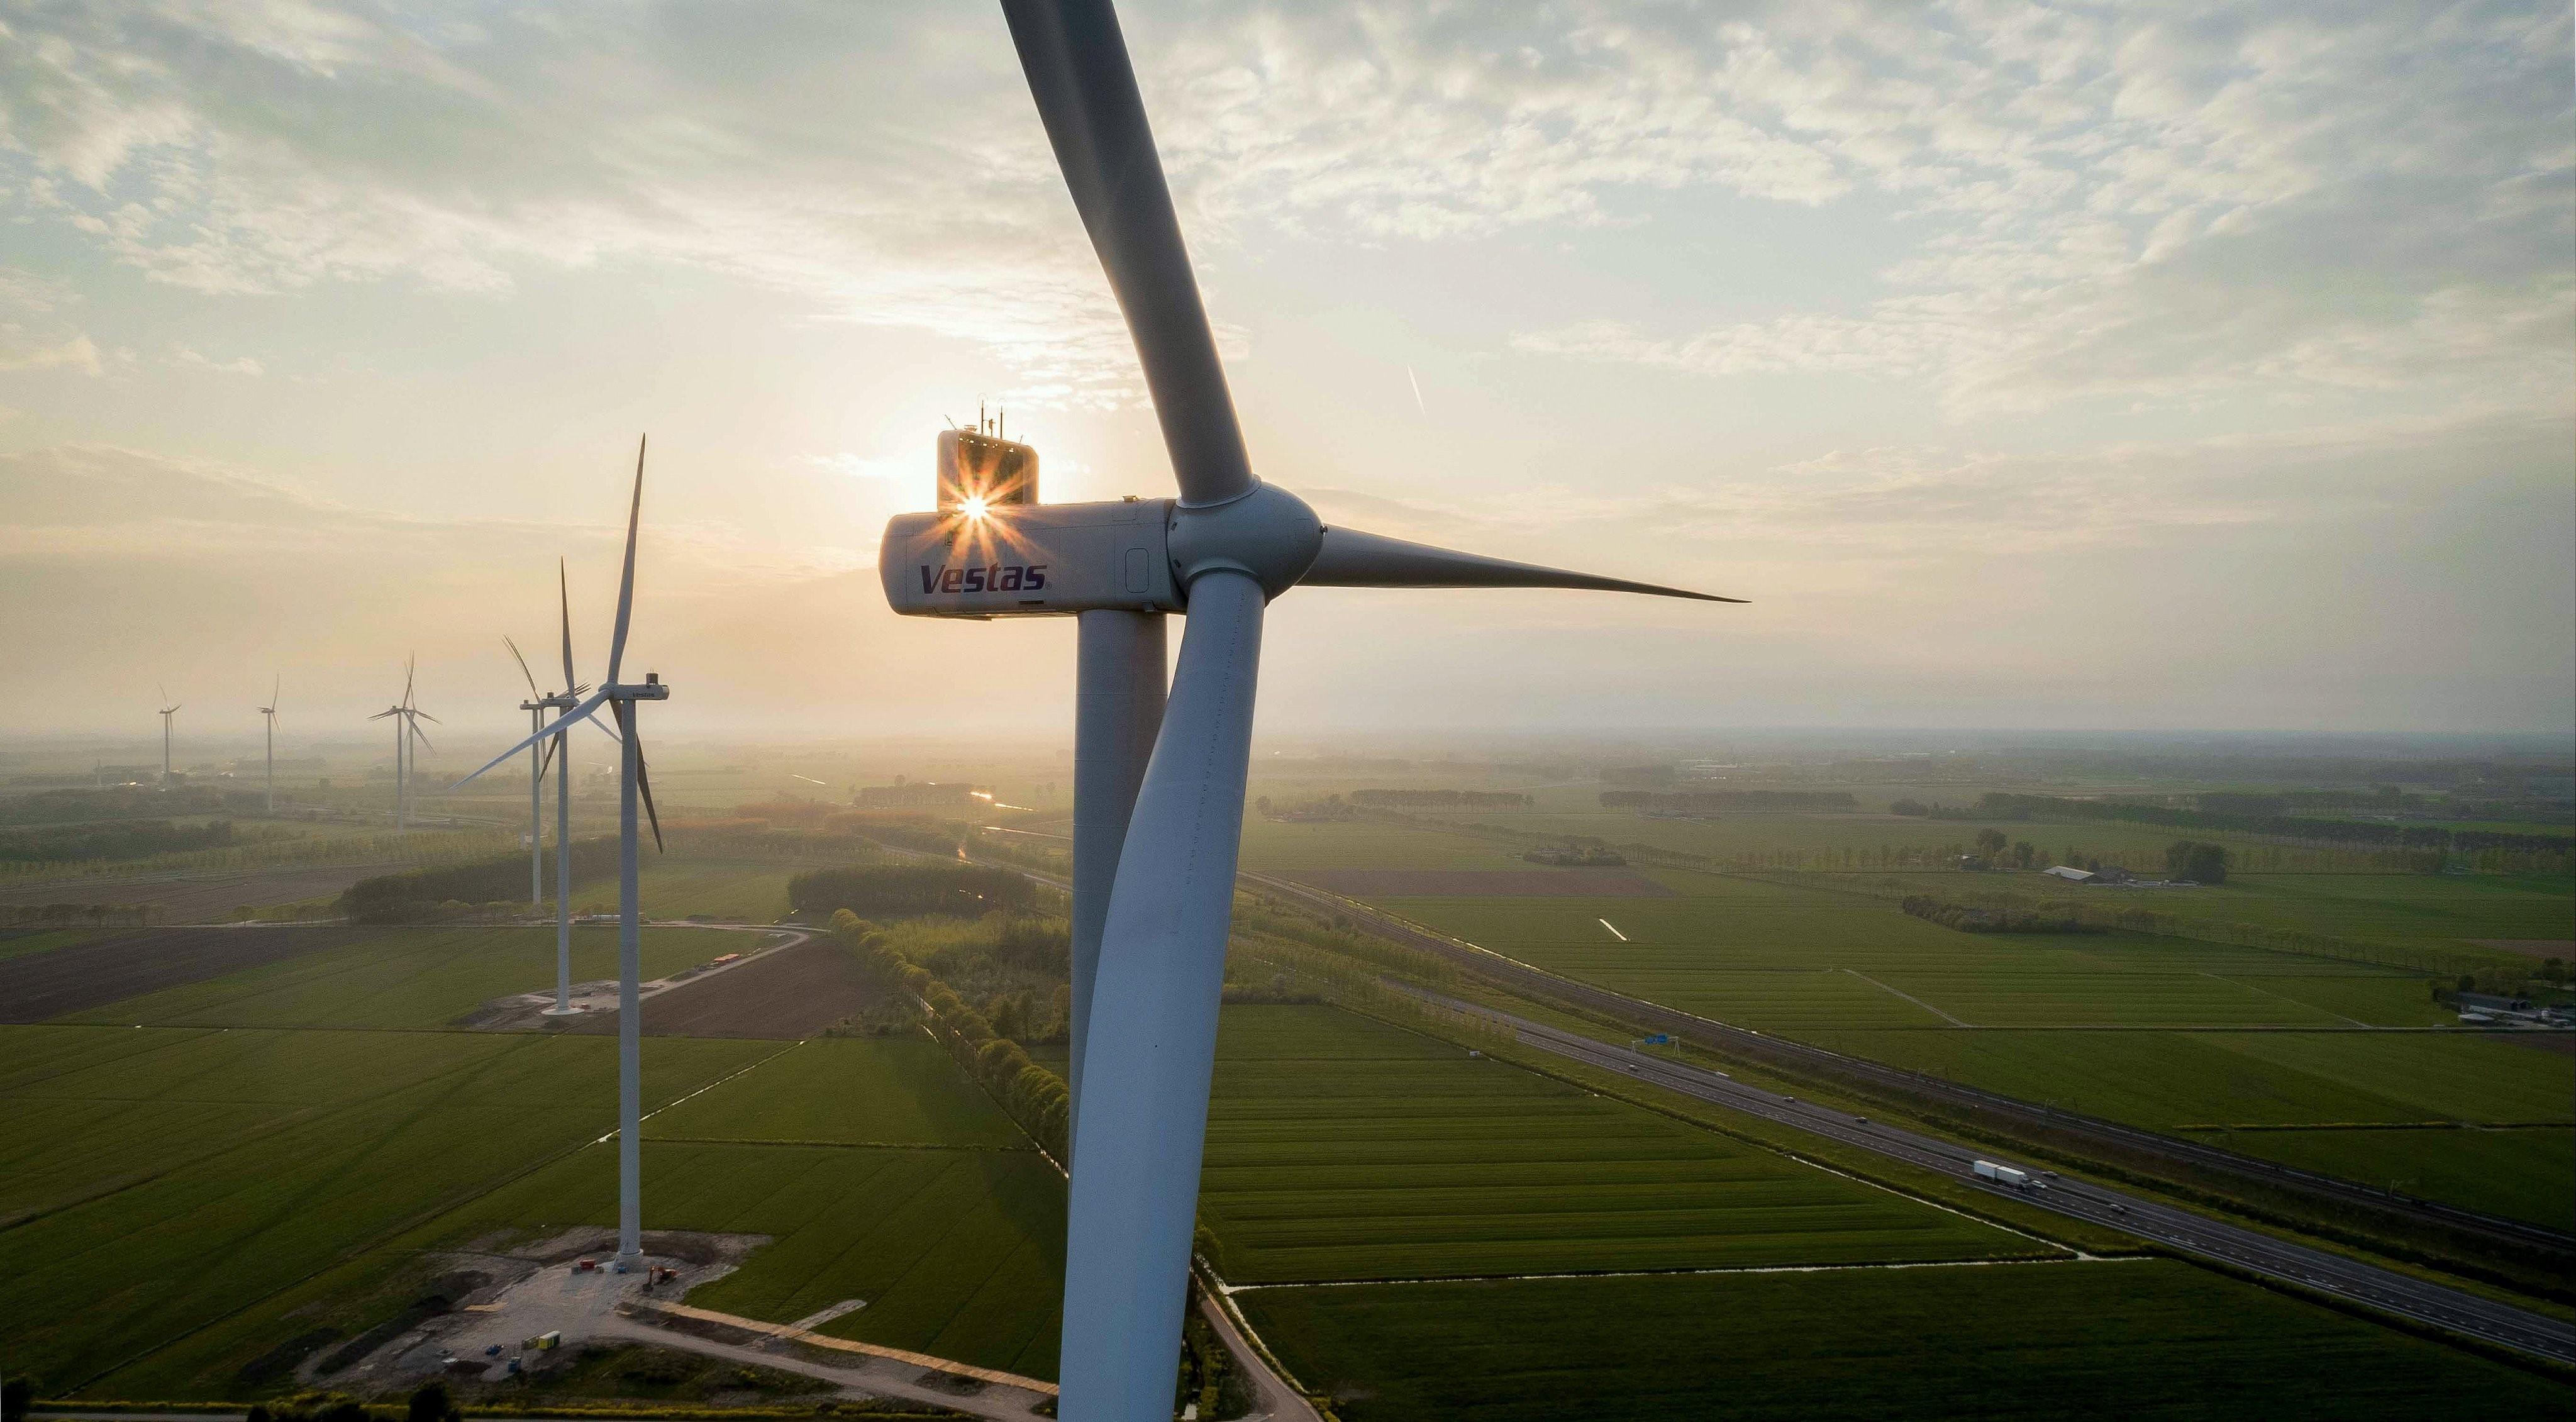 Burgerwindcoöperatie West-Betuwe neemt turbines windparken Deil en Avri over